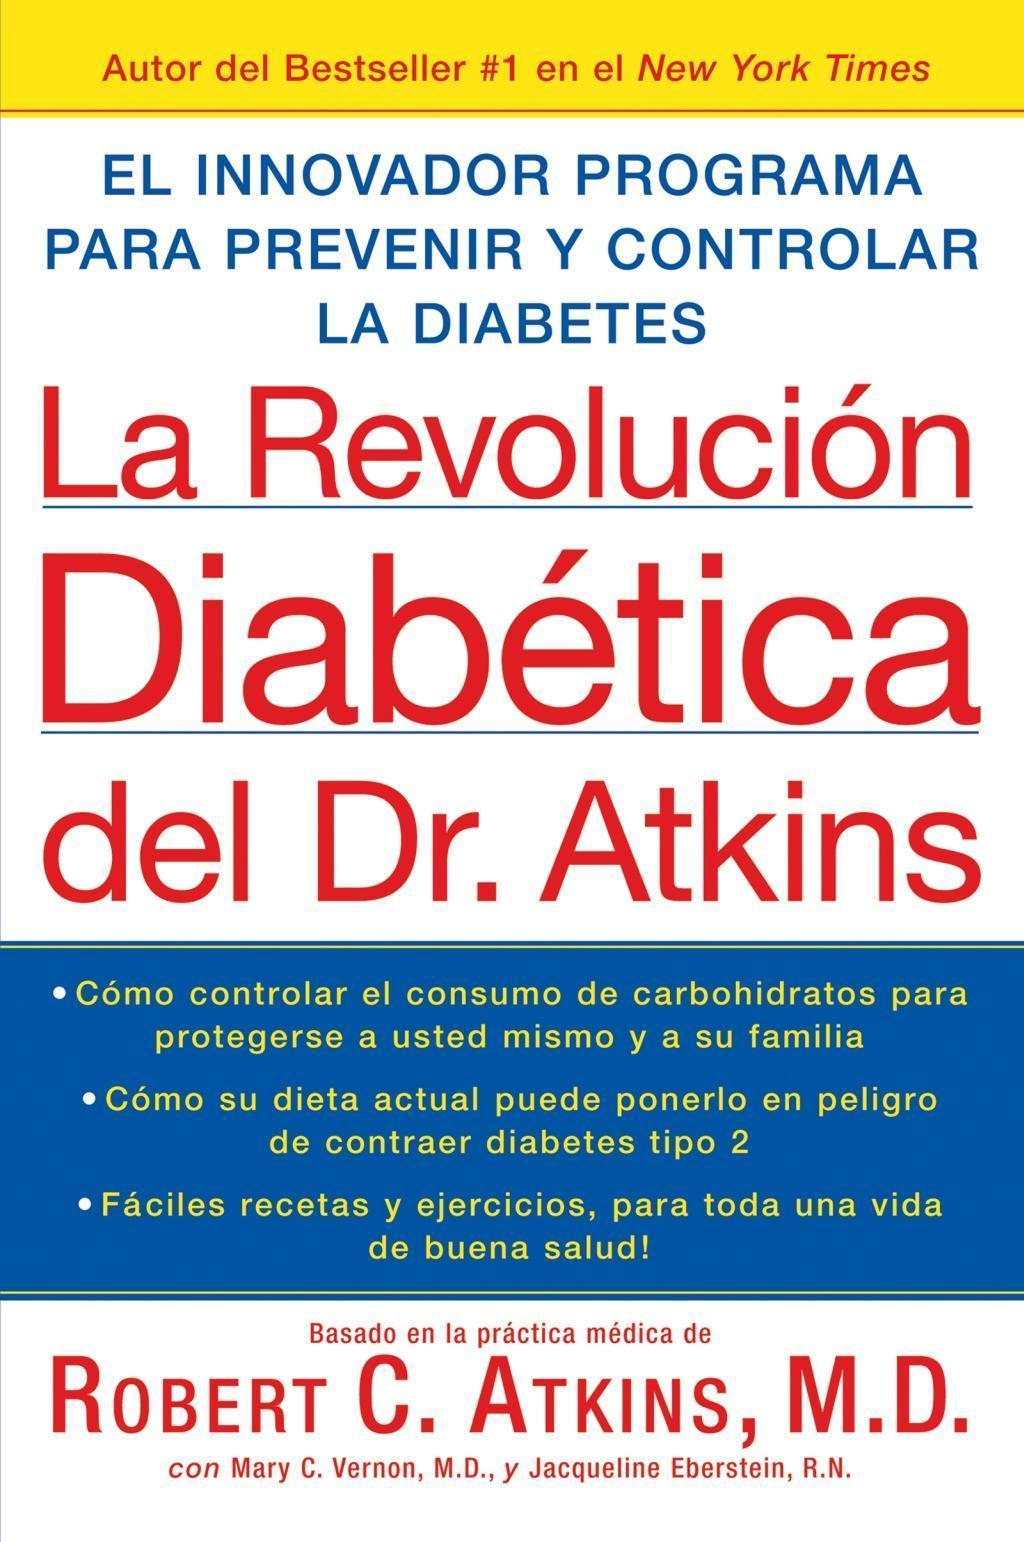 La Revolucion Diabetica del Dr. Atkins